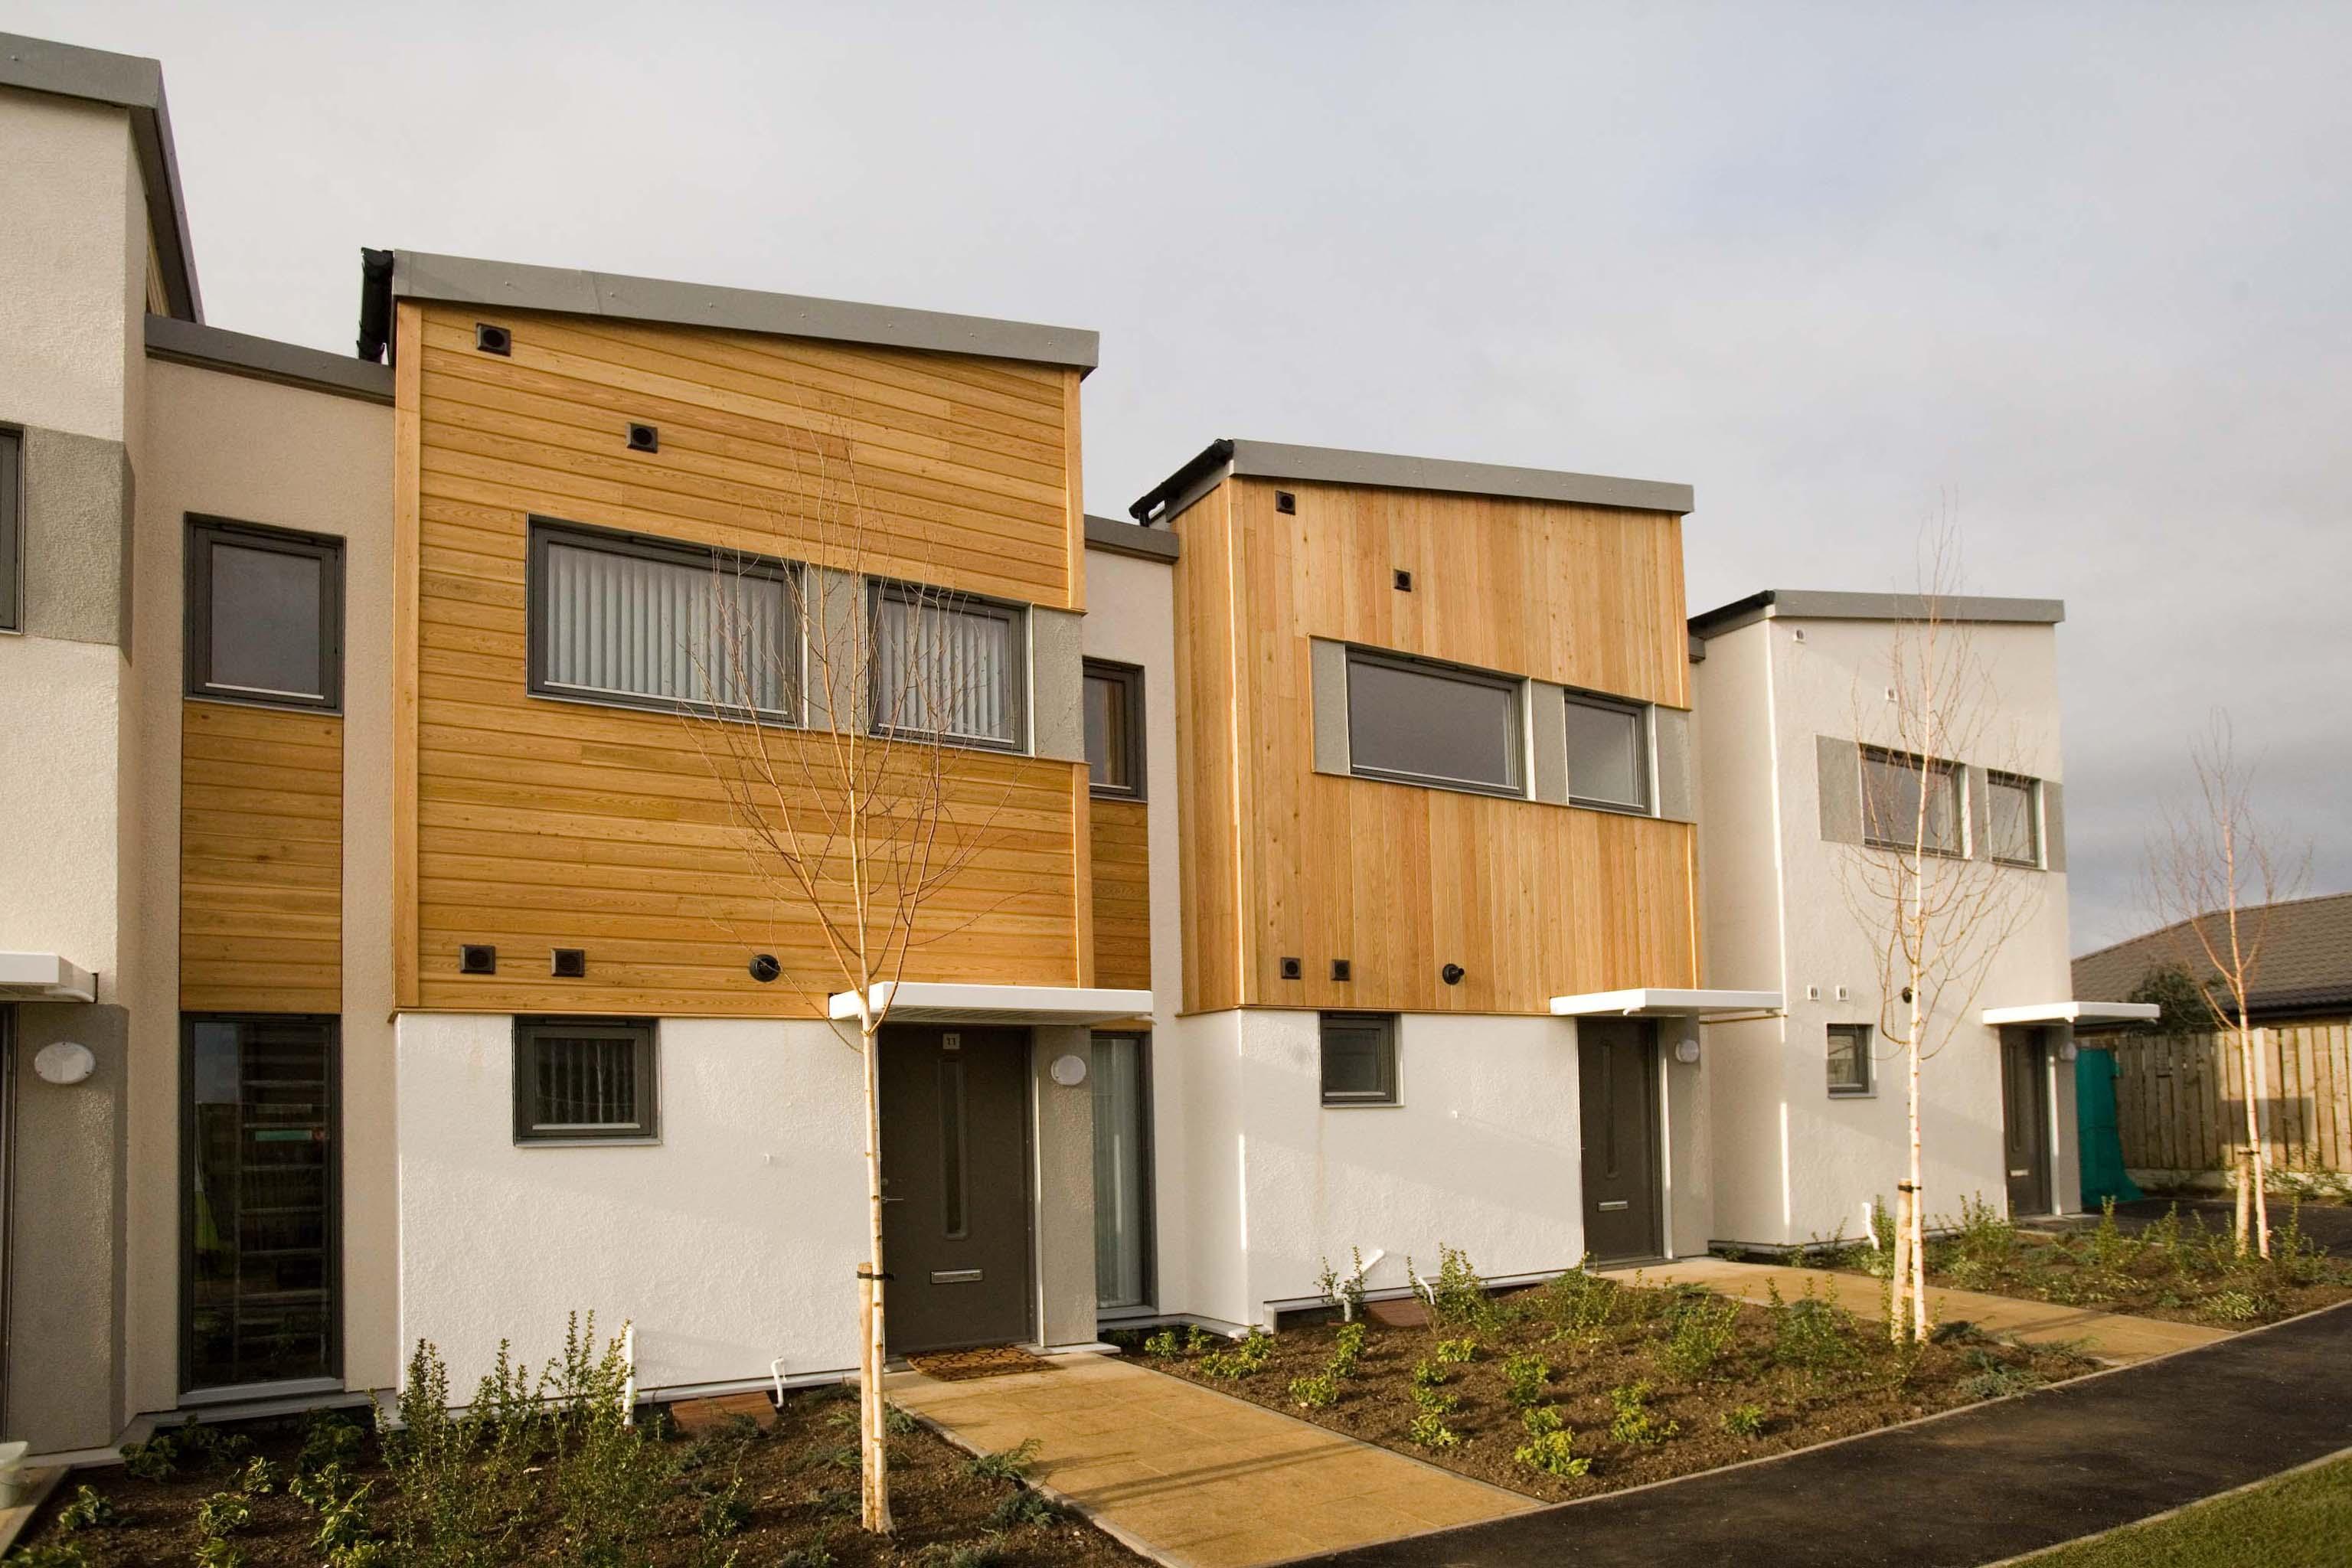 Boklok las casas modulares de ikea la urbana - Casa prefabricadas modulares ...